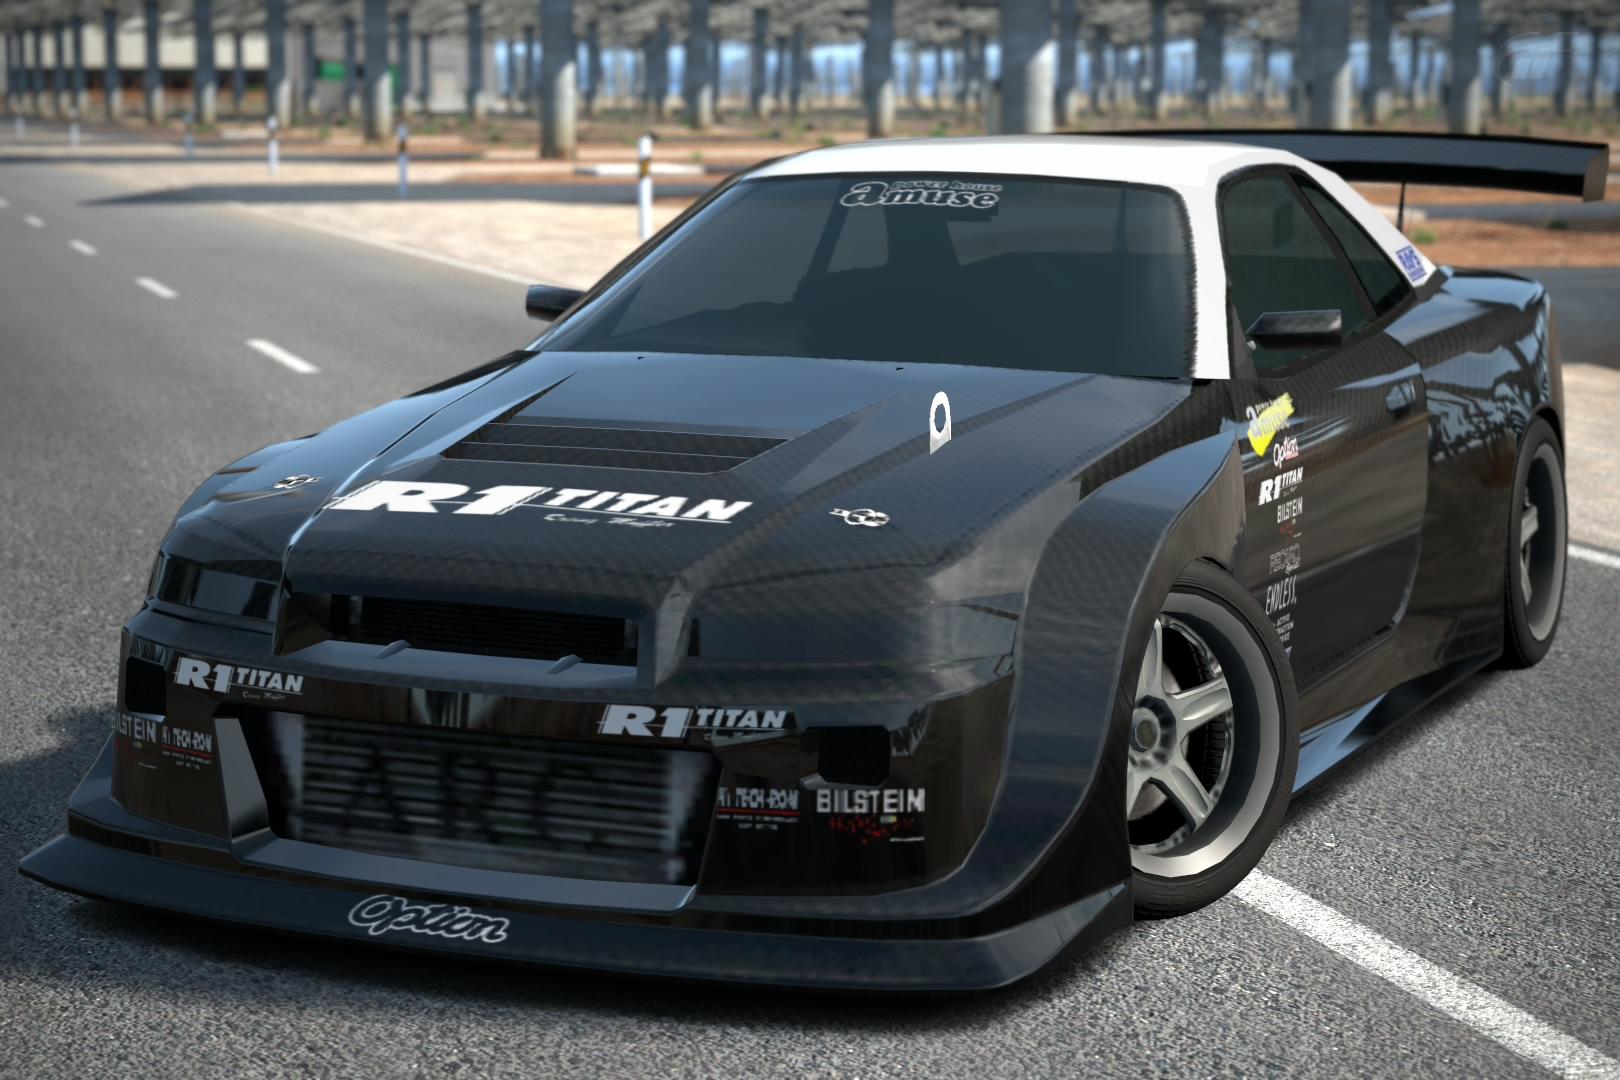 Alfa Romeo 4c >> Amuse Carbon R (R34) '04   Gran Turismo Wiki   FANDOM powered by Wikia